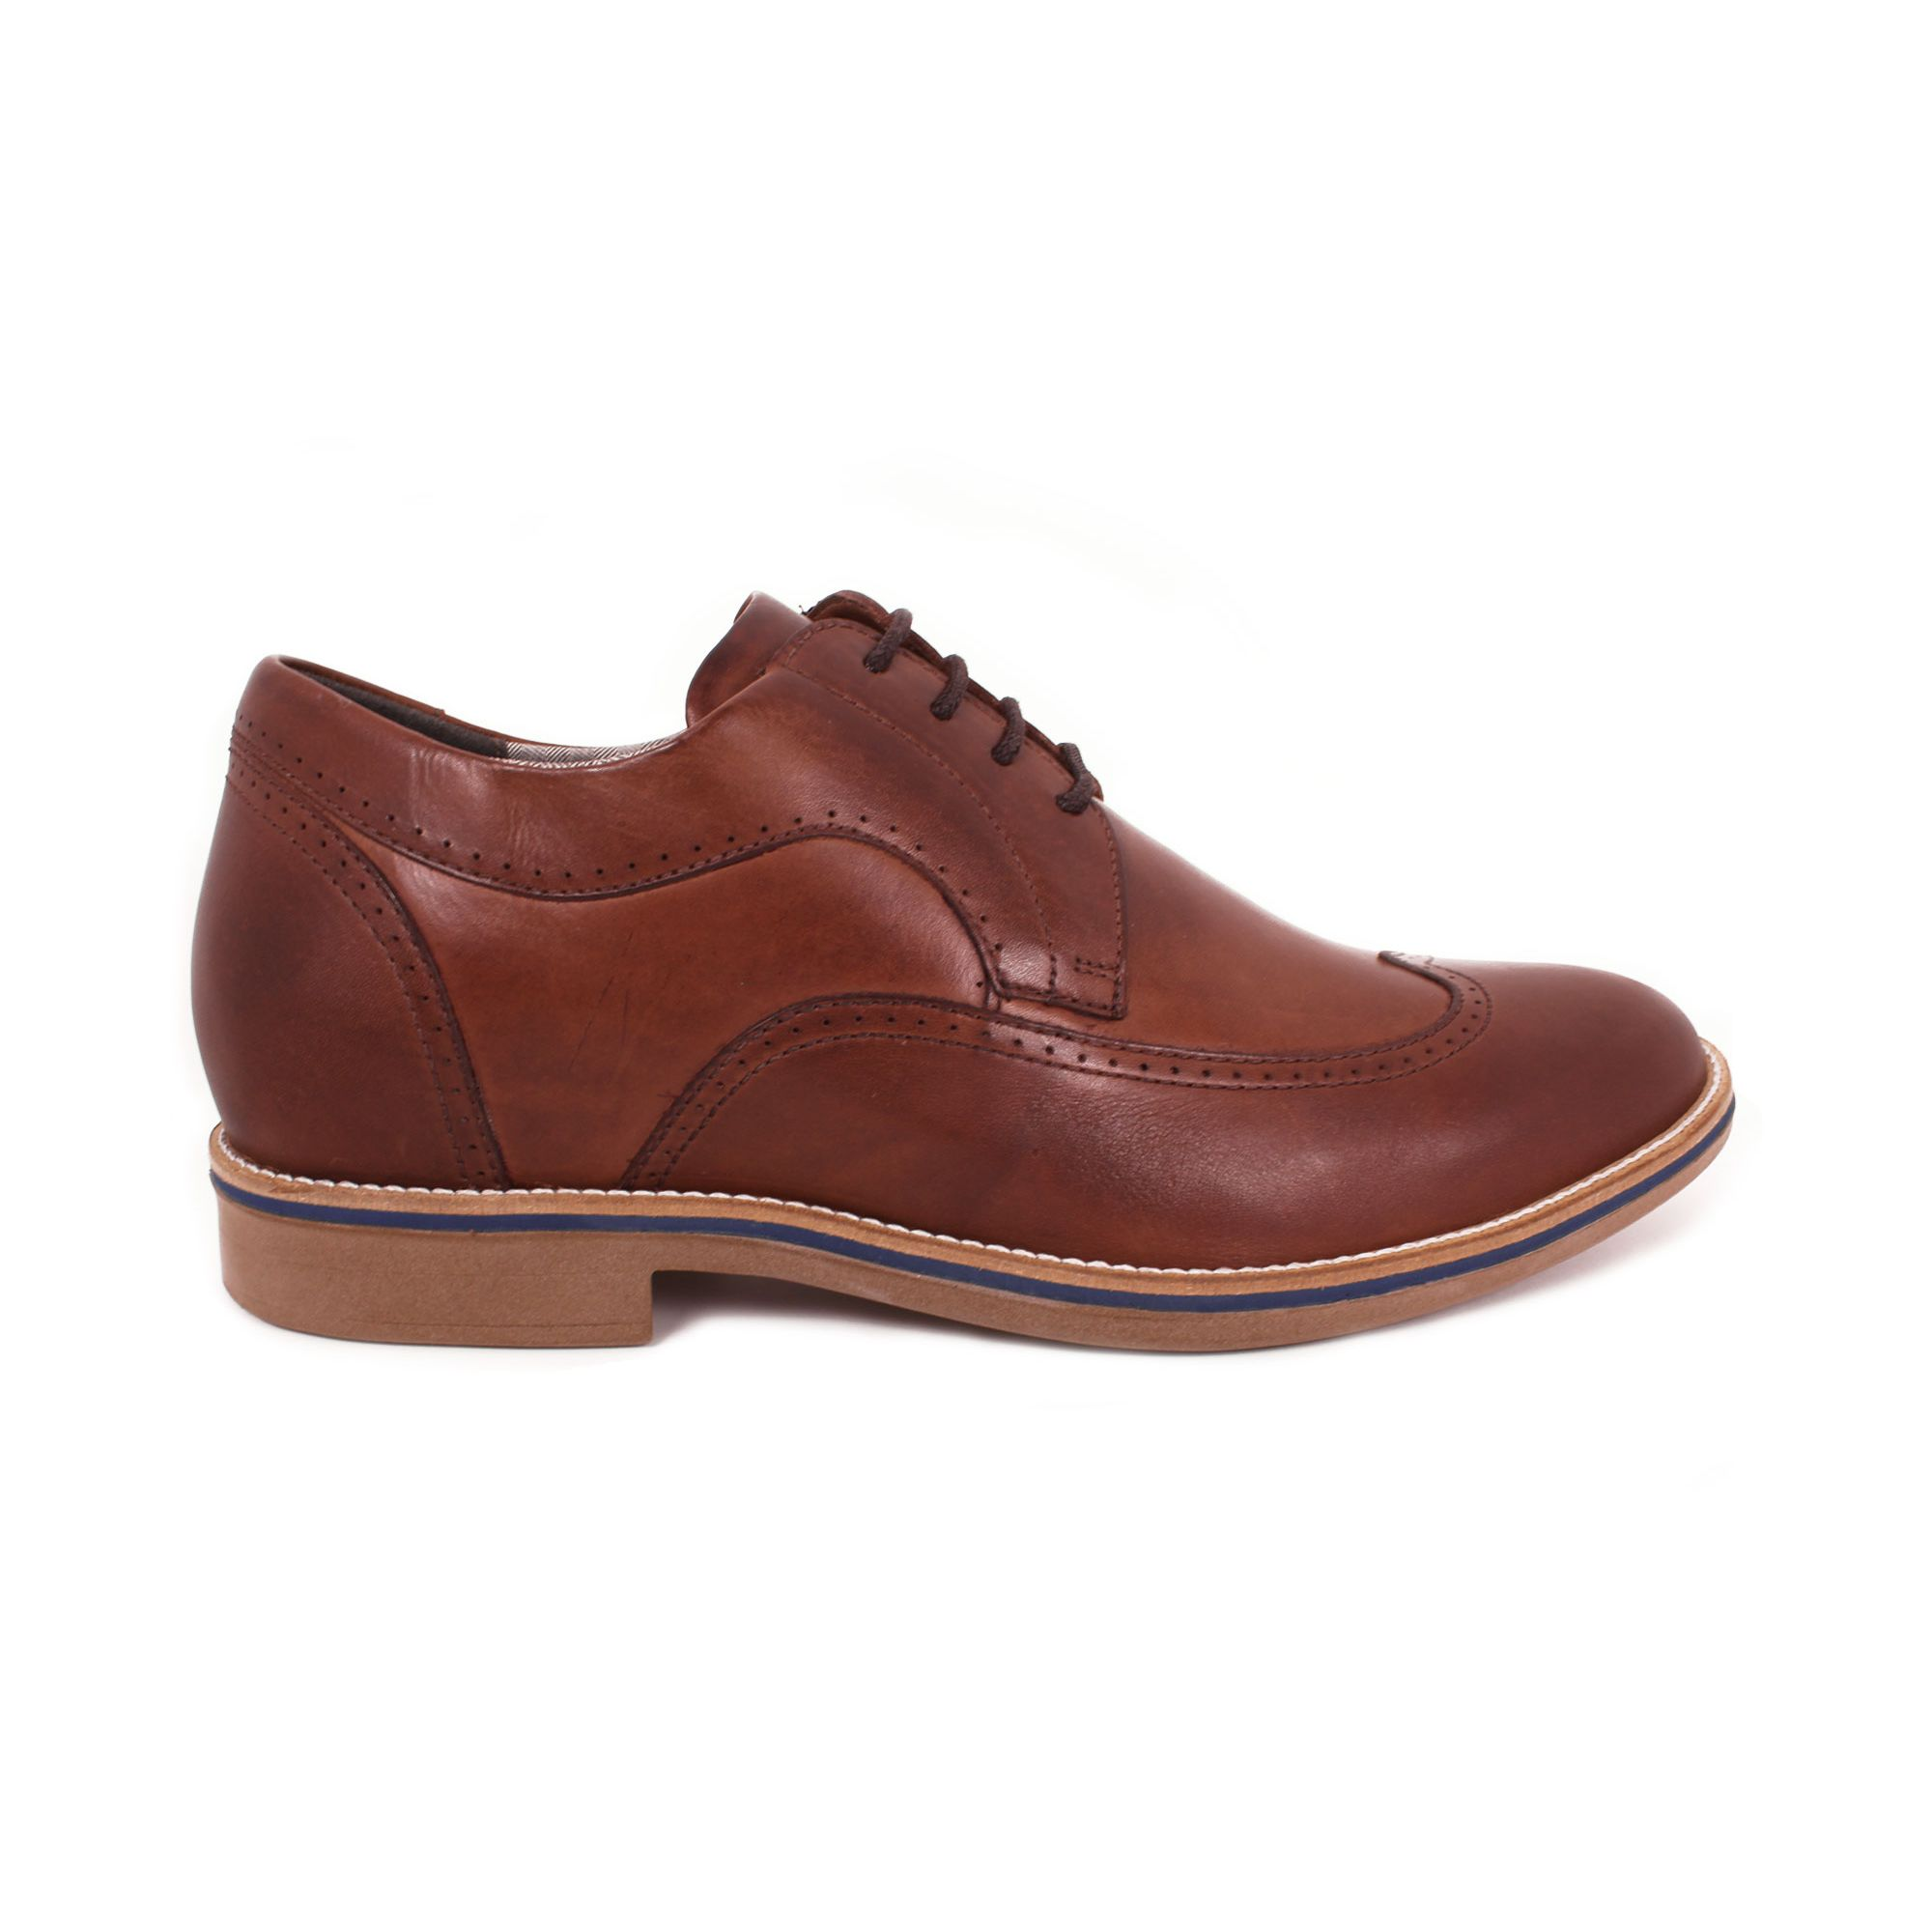 Zapato Casual Oxford Café Oscuro Max Denegri +7cm de Altura_71059